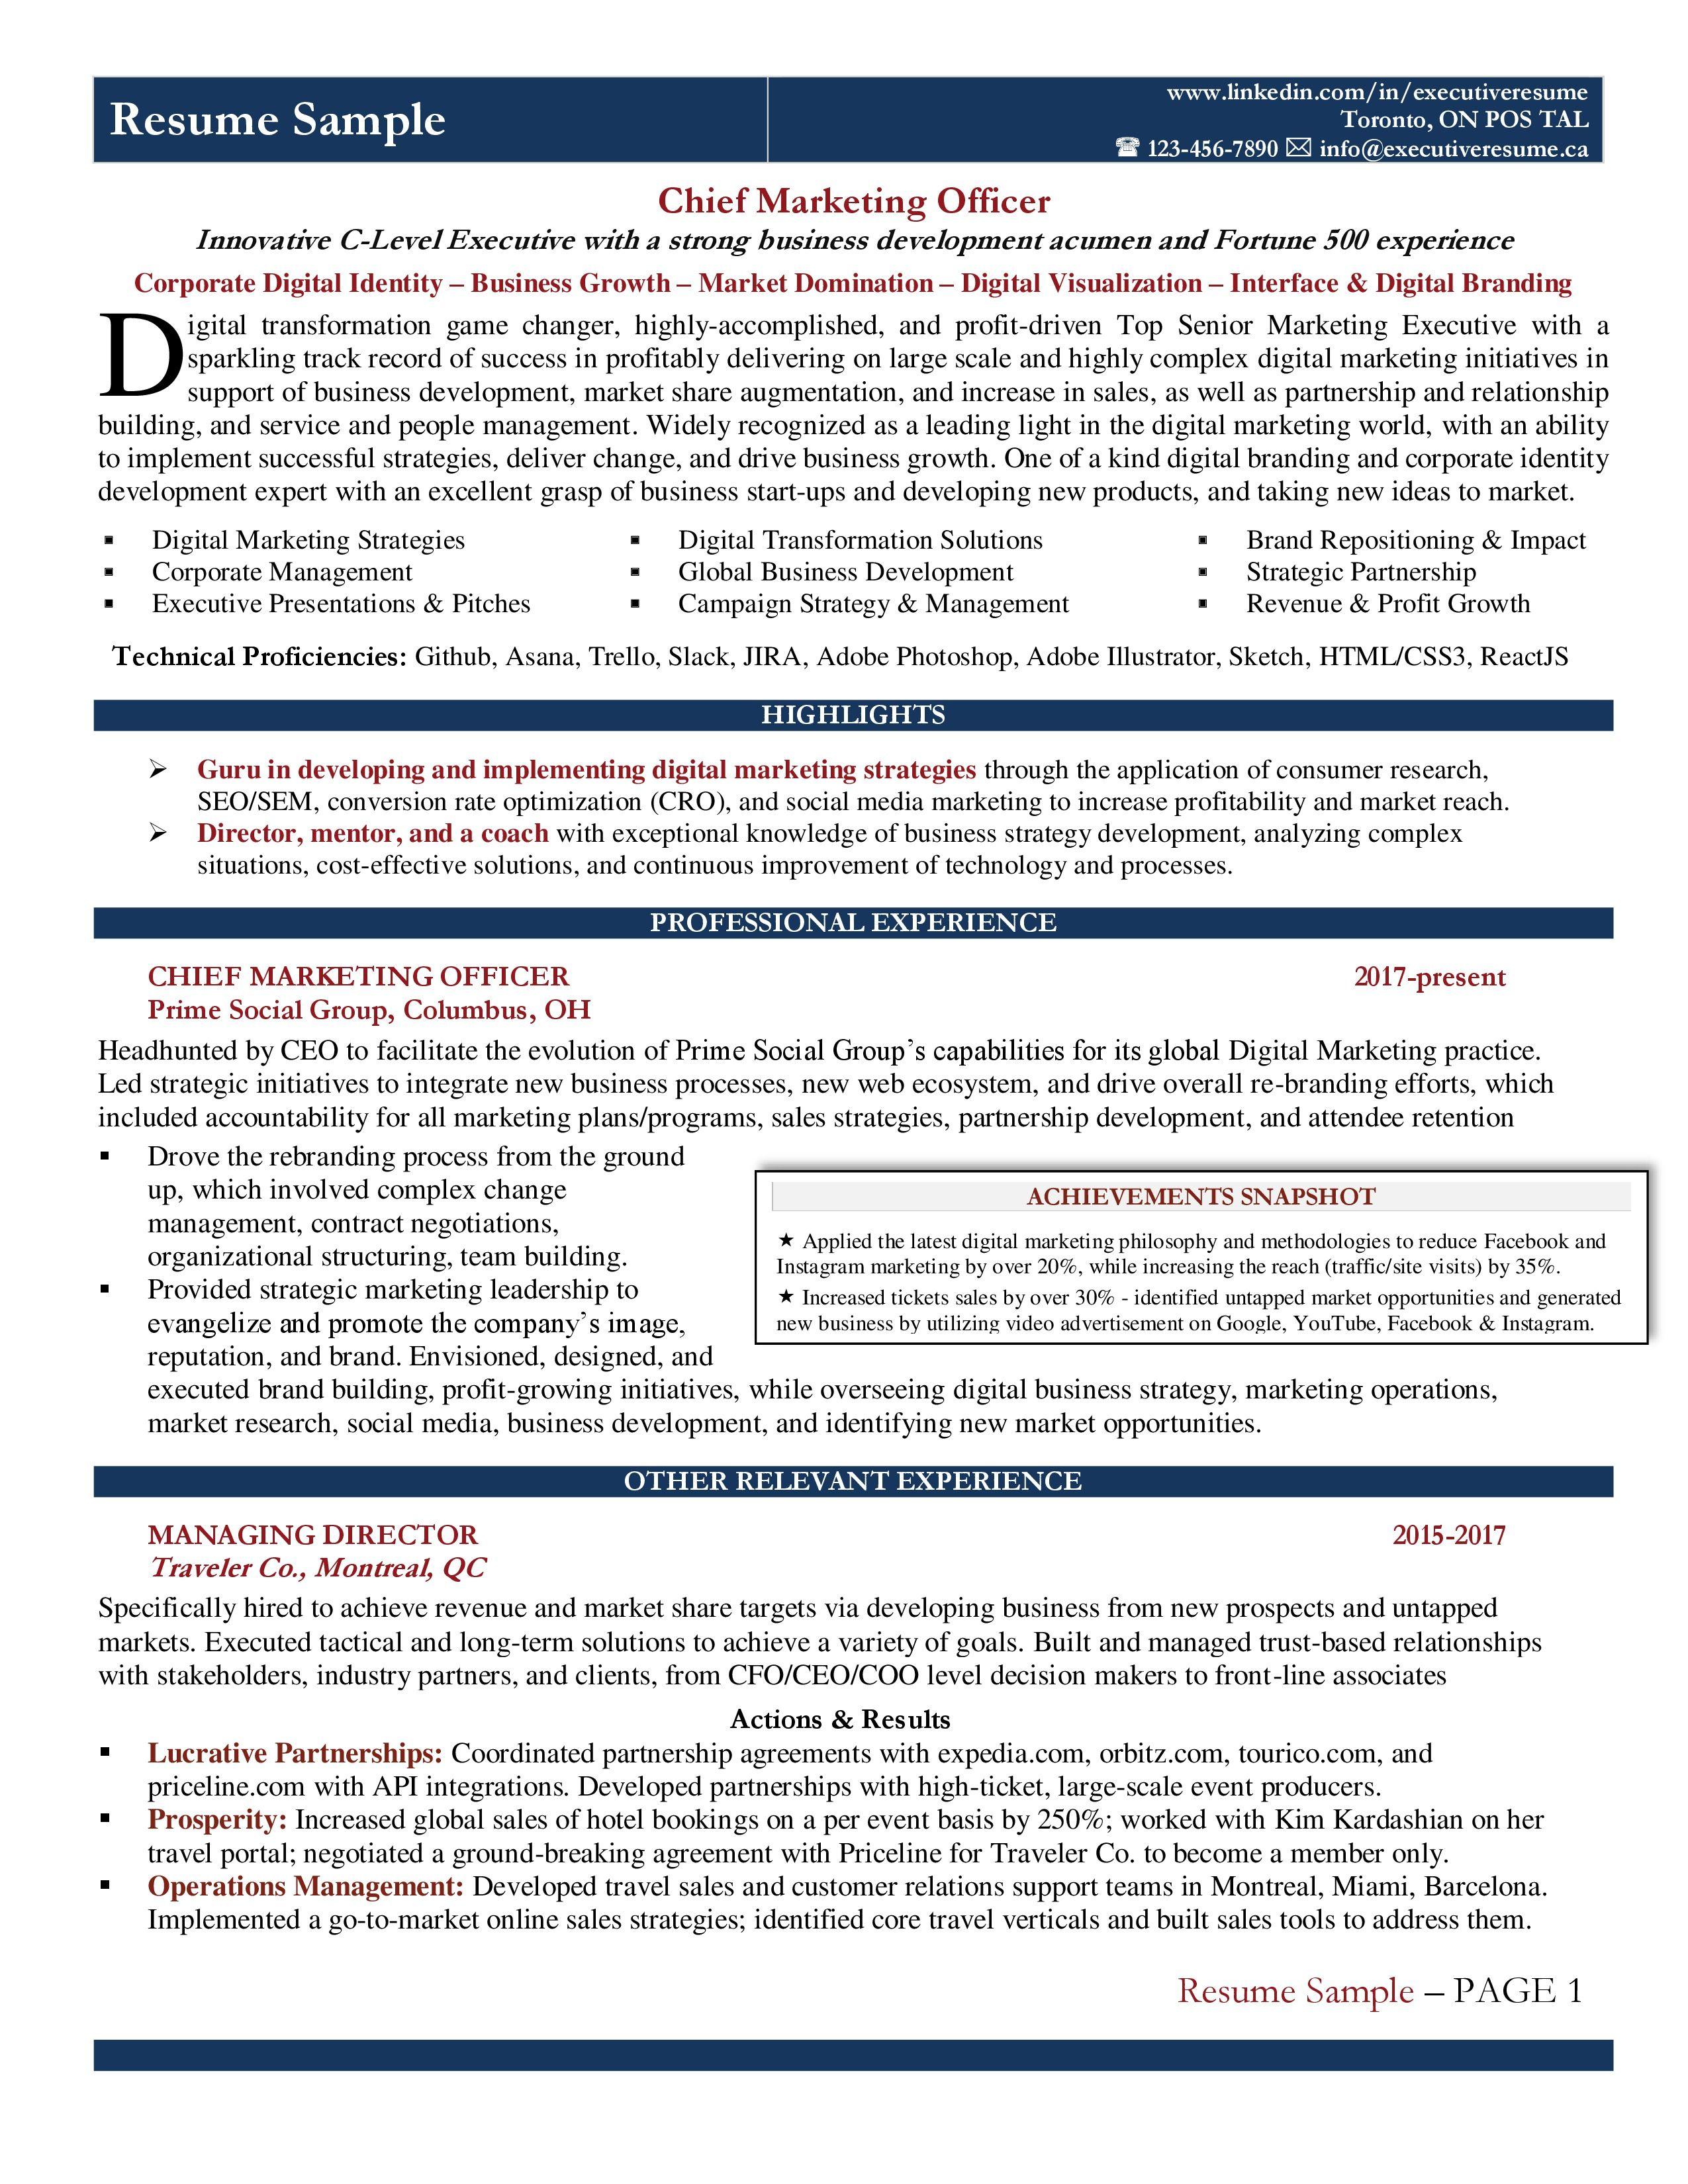 Single Post Professional resume writing service, Resume